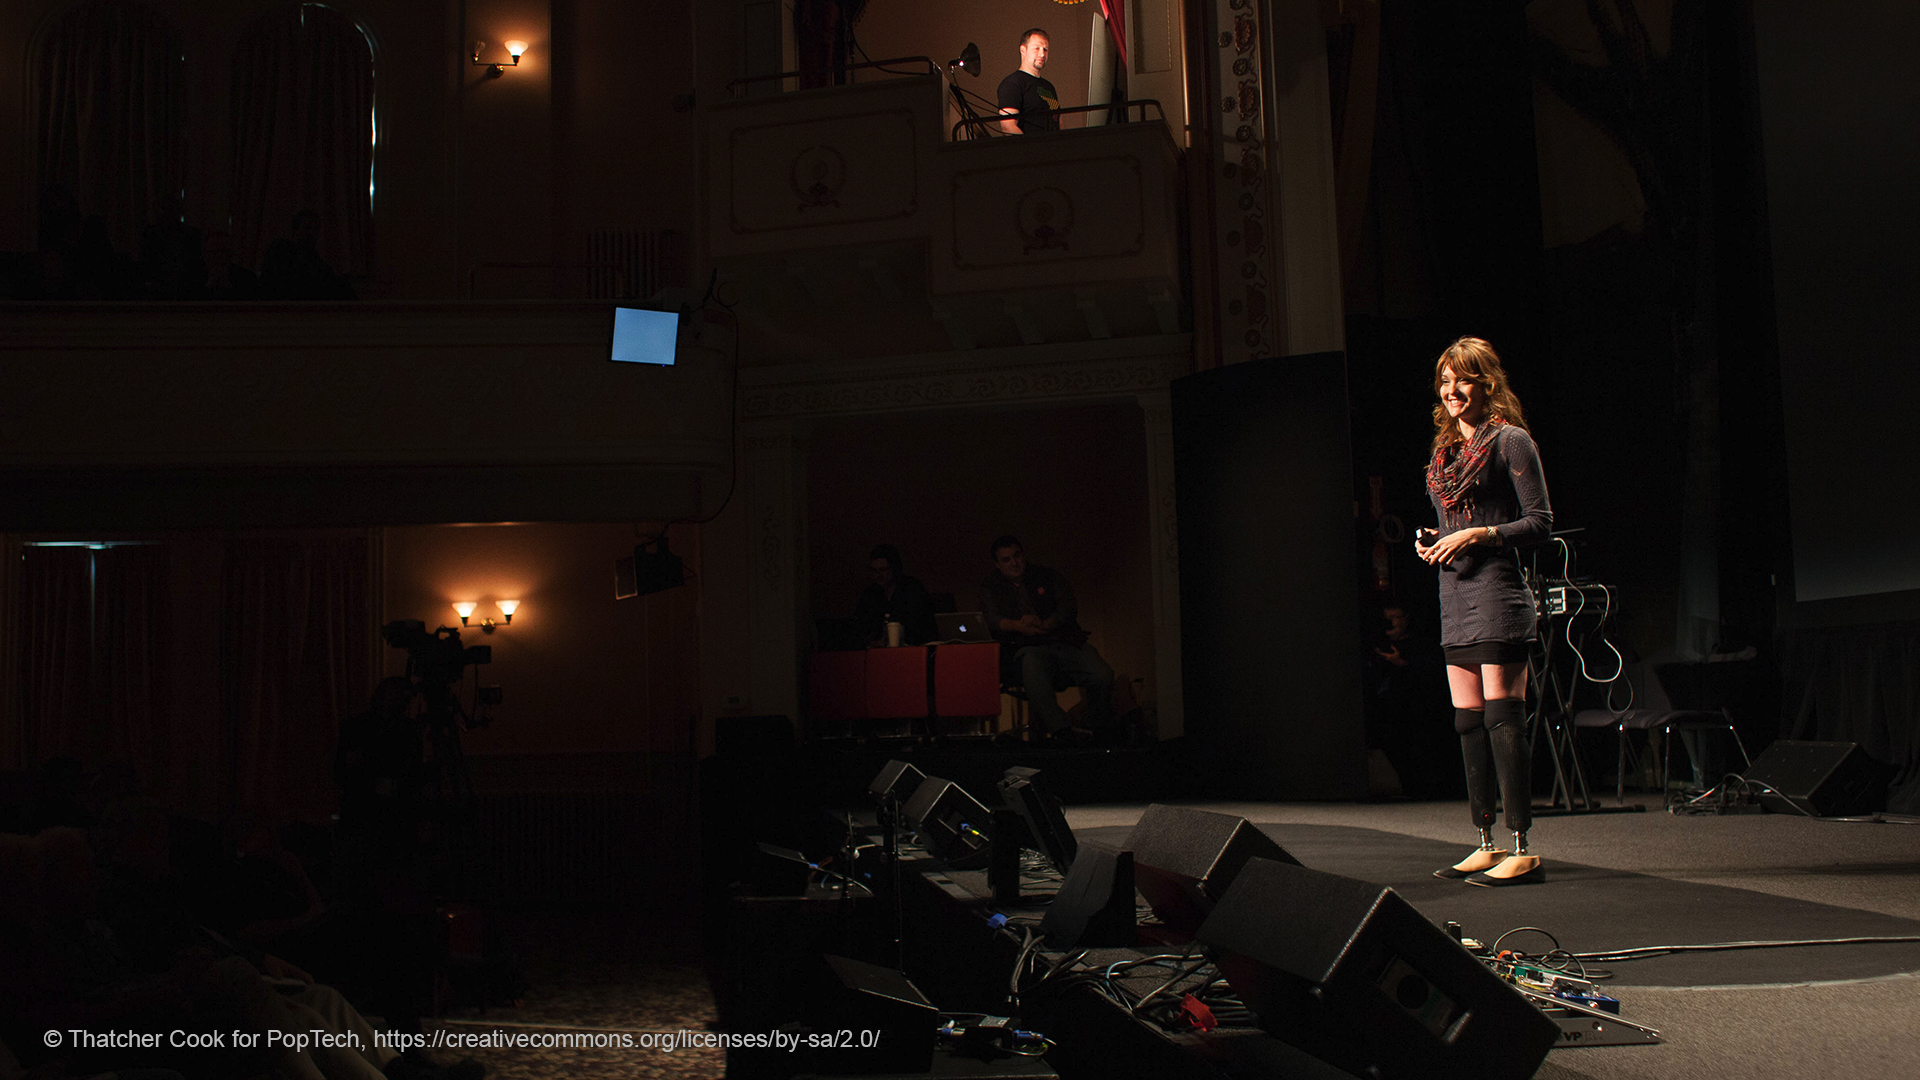 storytelling presentation skills are used in TED talks